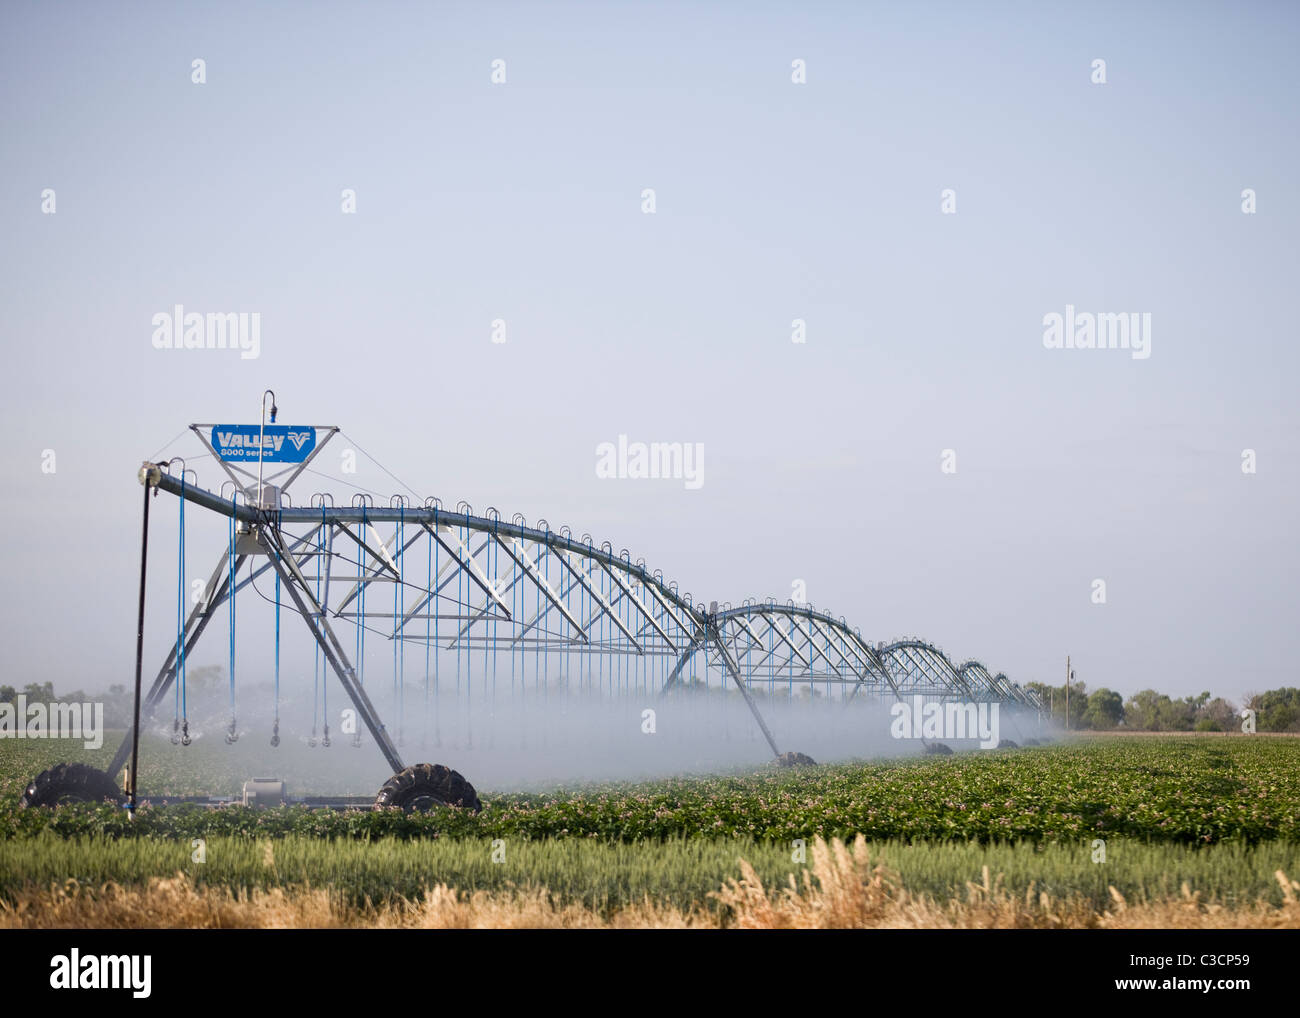 Agricultural crop irrigation system - Stock Image